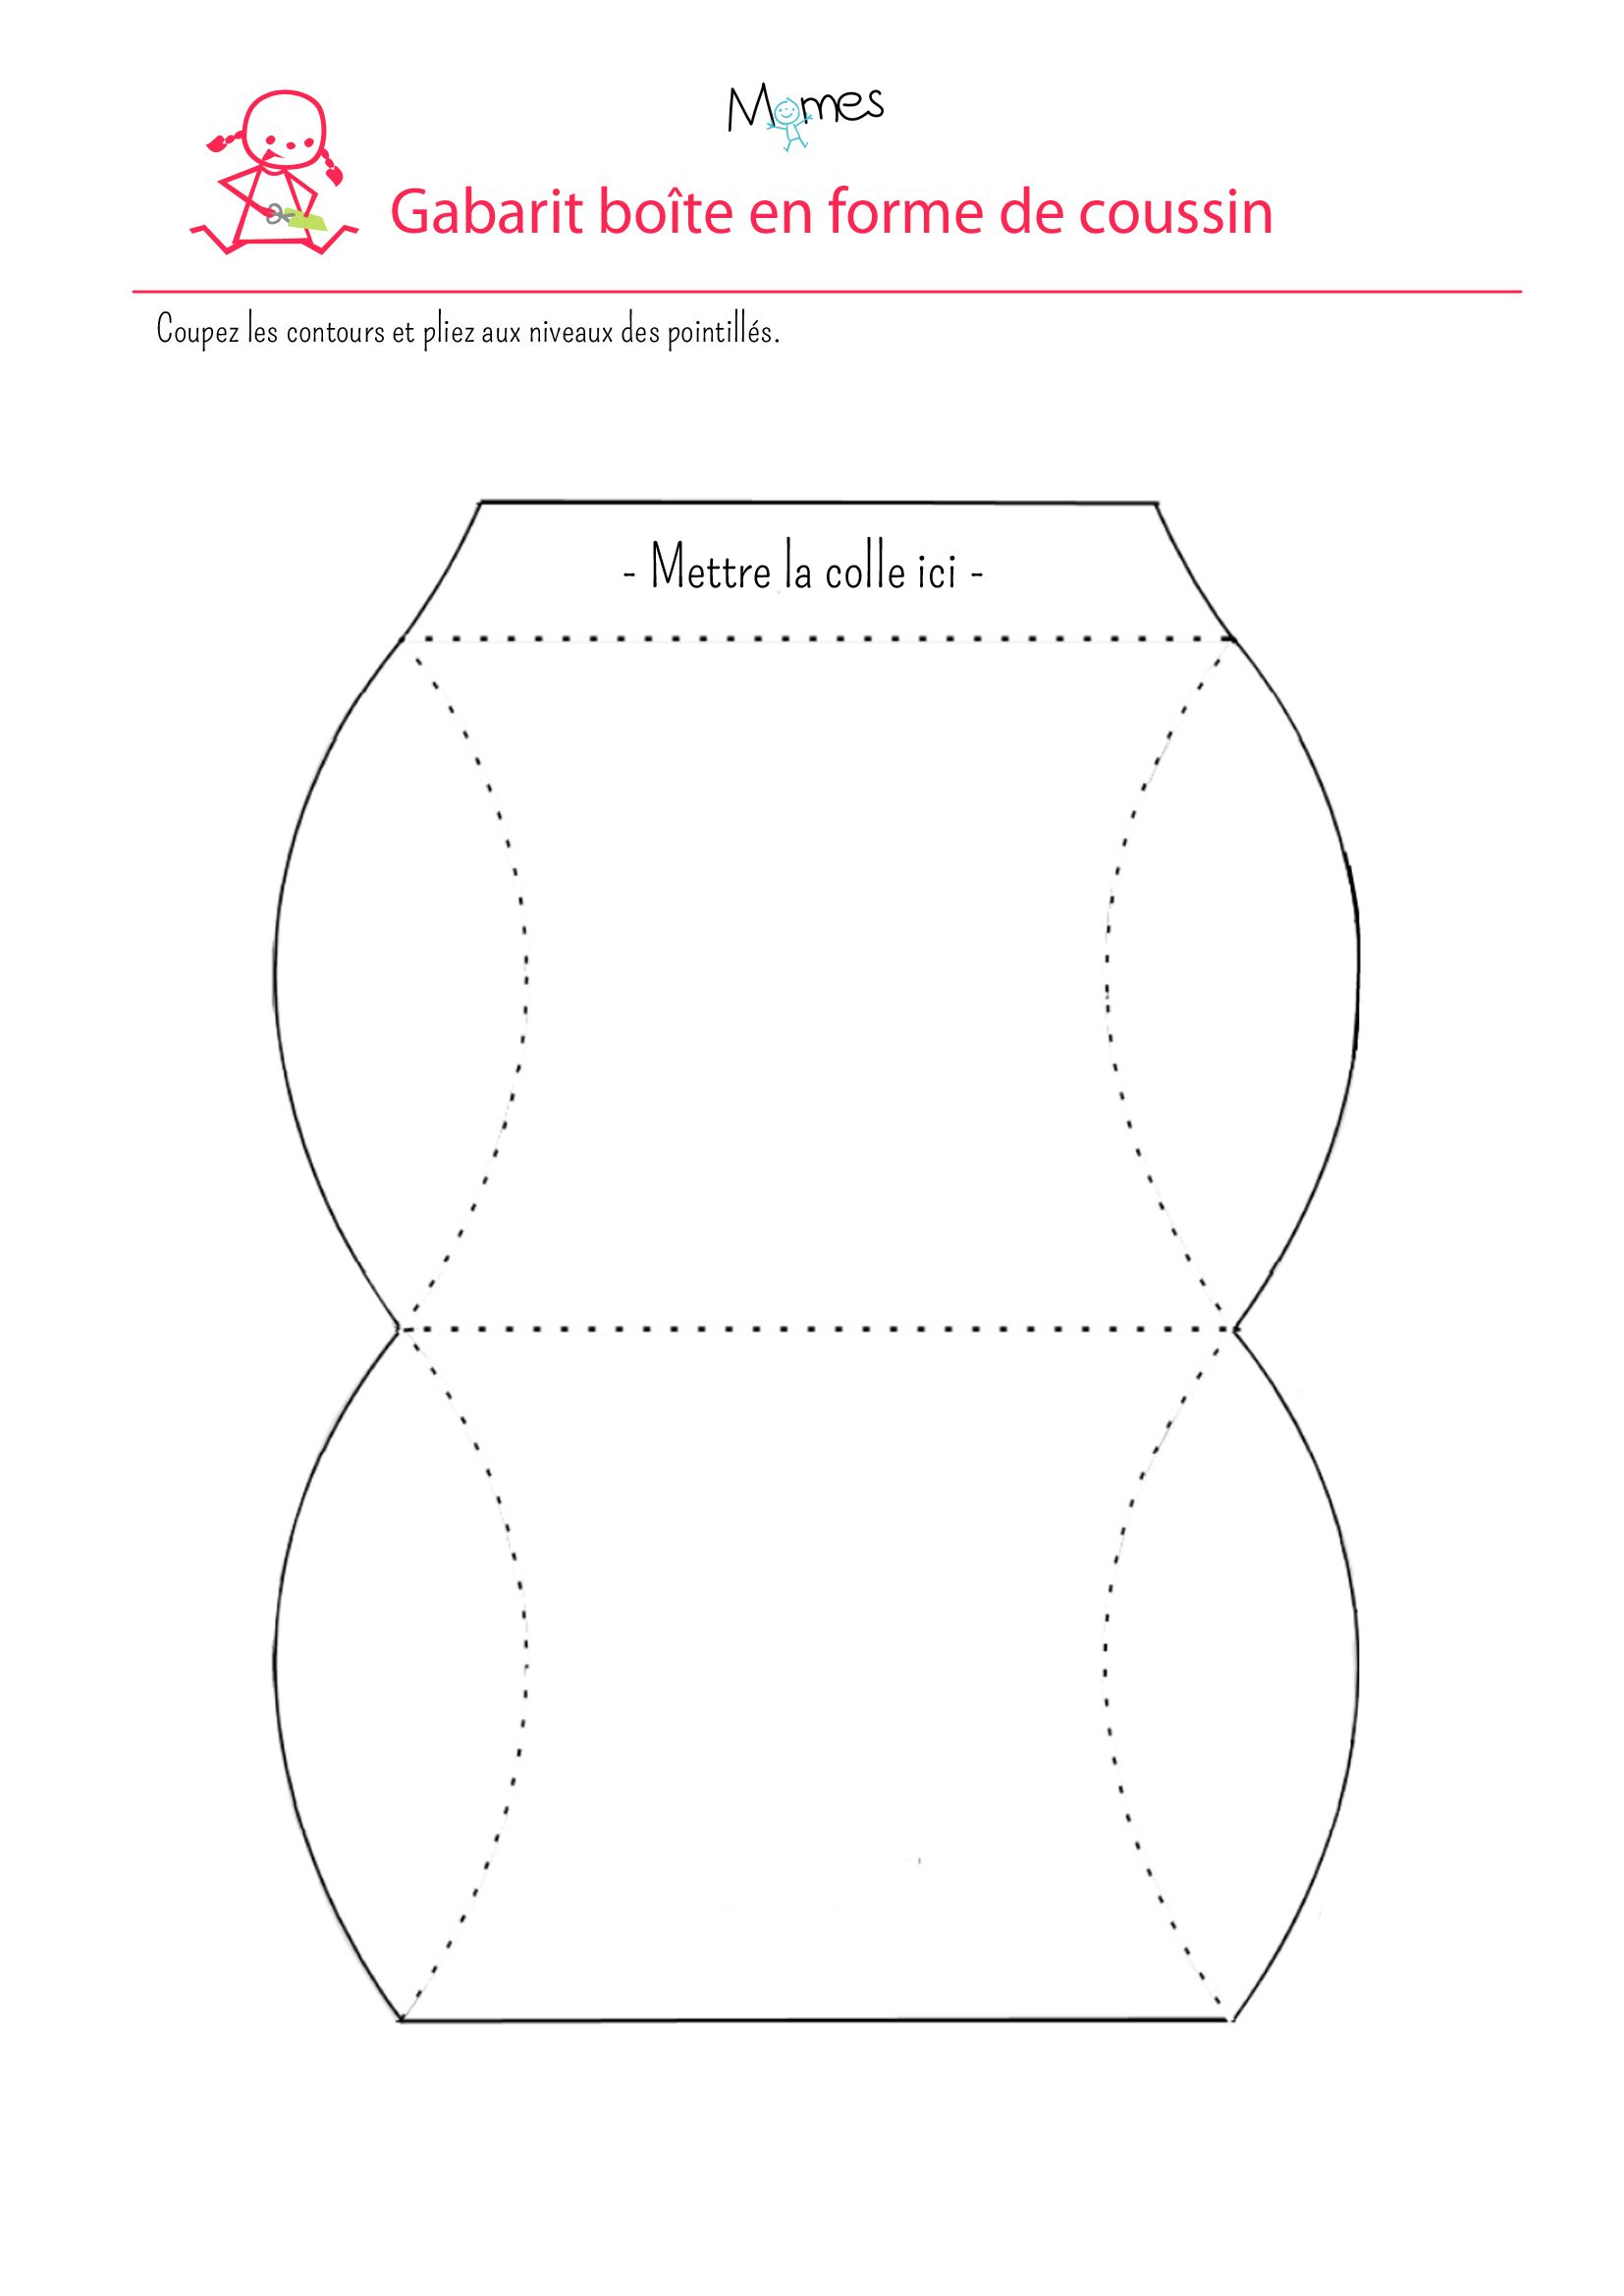 bo te cadeau imprimer id es cr atives boite cadeau cadeau et boite. Black Bedroom Furniture Sets. Home Design Ideas